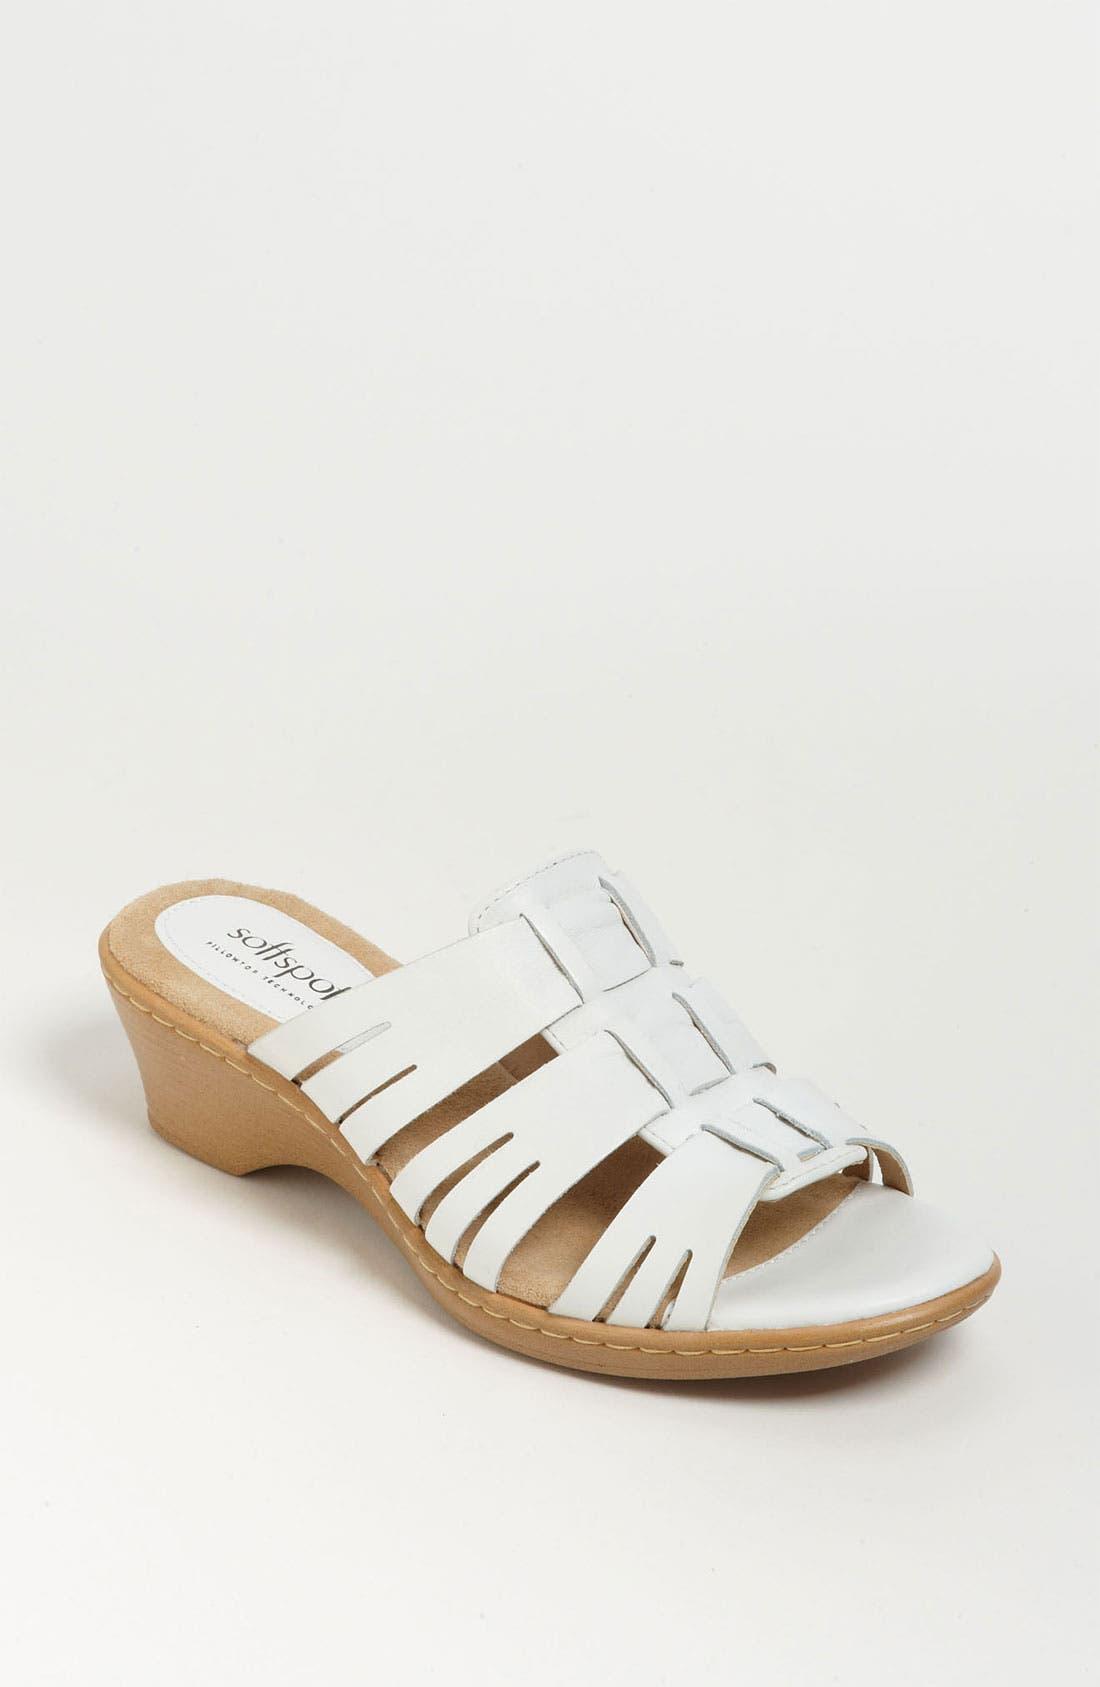 Alternate Image 1 Selected - Softspots 'Hilary' Sandal